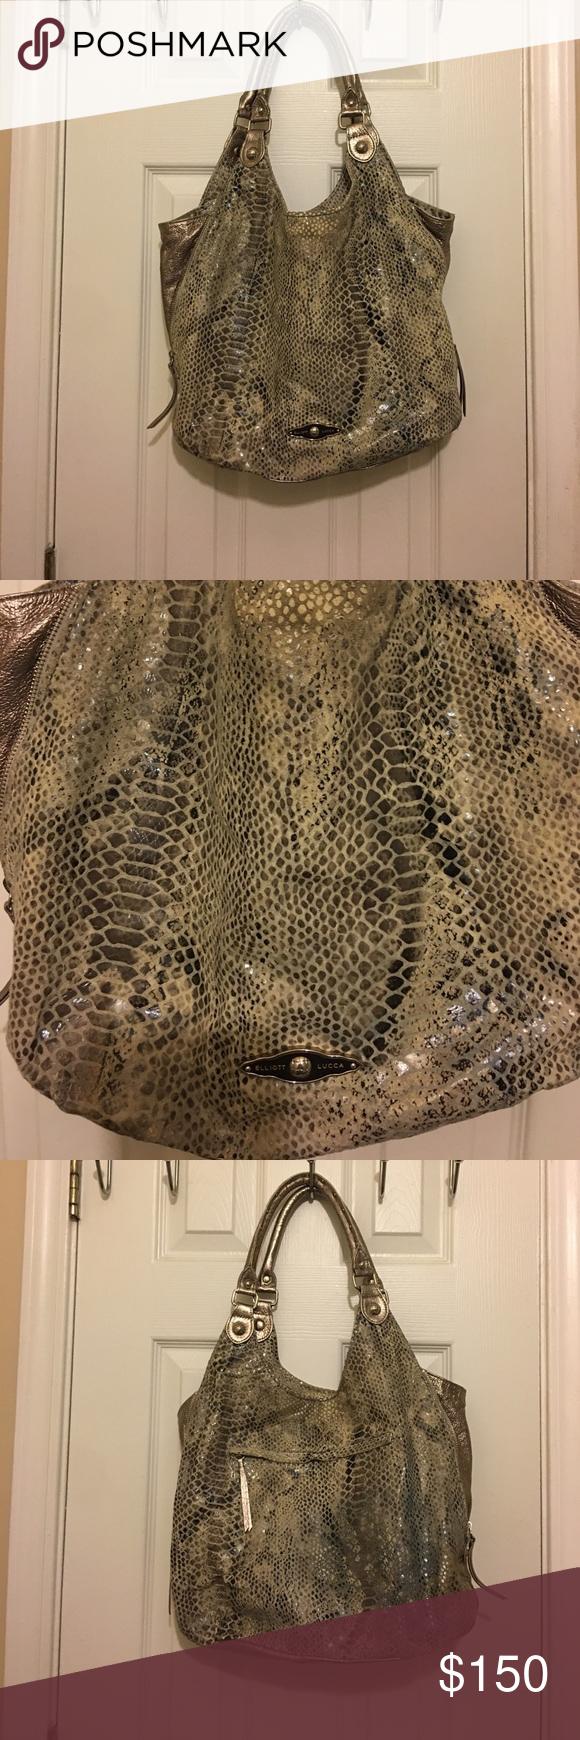 Large Elliott Luca handbag Gorgeous, Large Elliott Luca snakeskin leather handbag. Elliott Lucca Bags Hobos